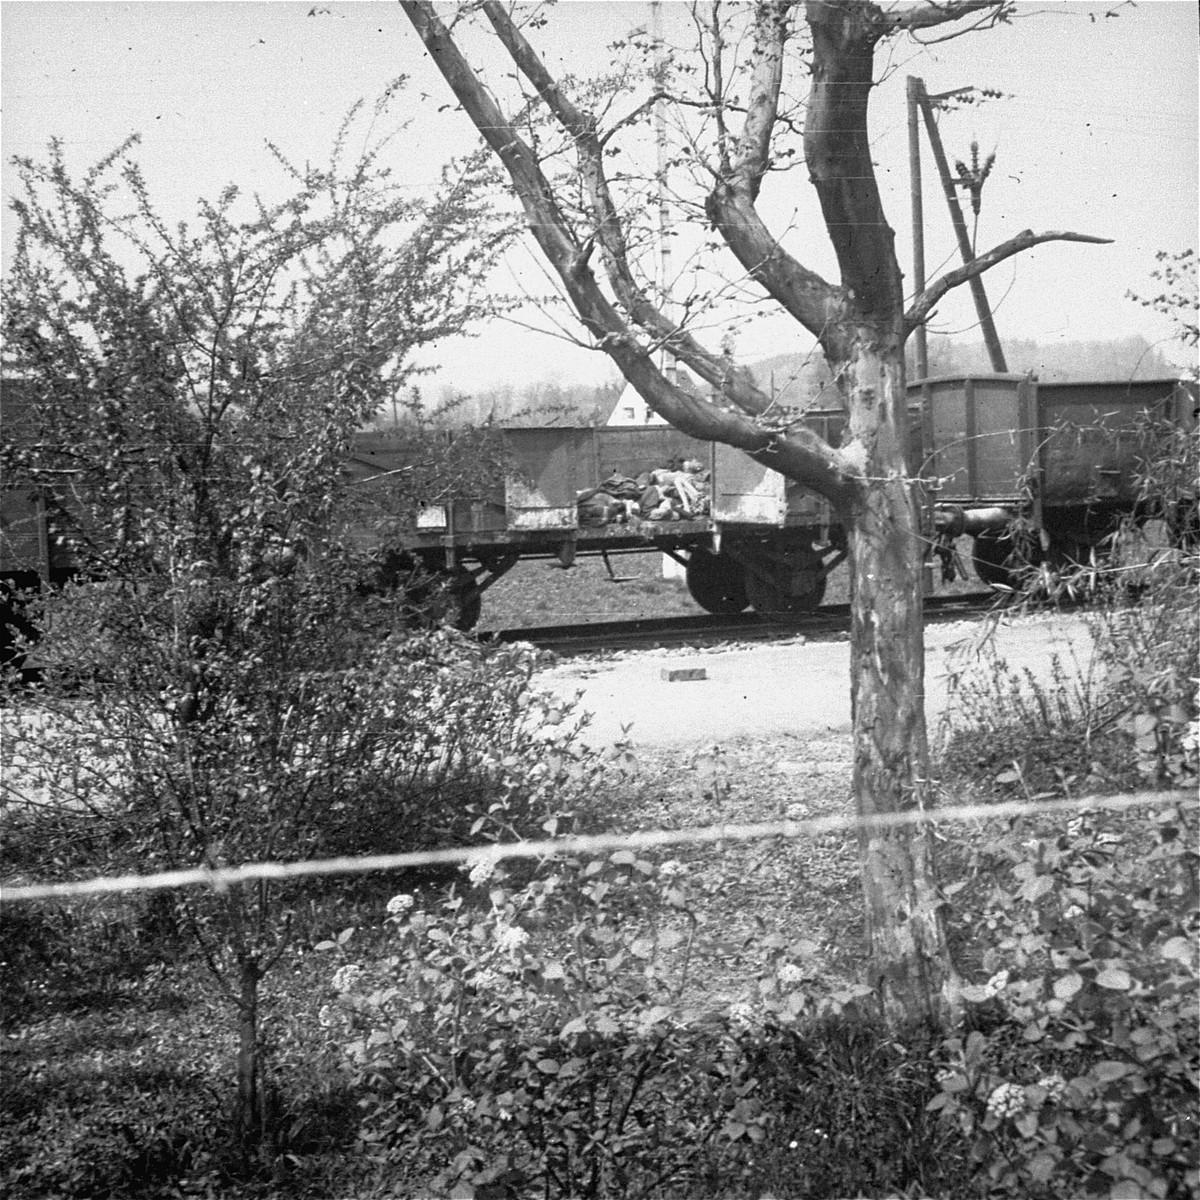 View of the open railcars of the Dachau death train.